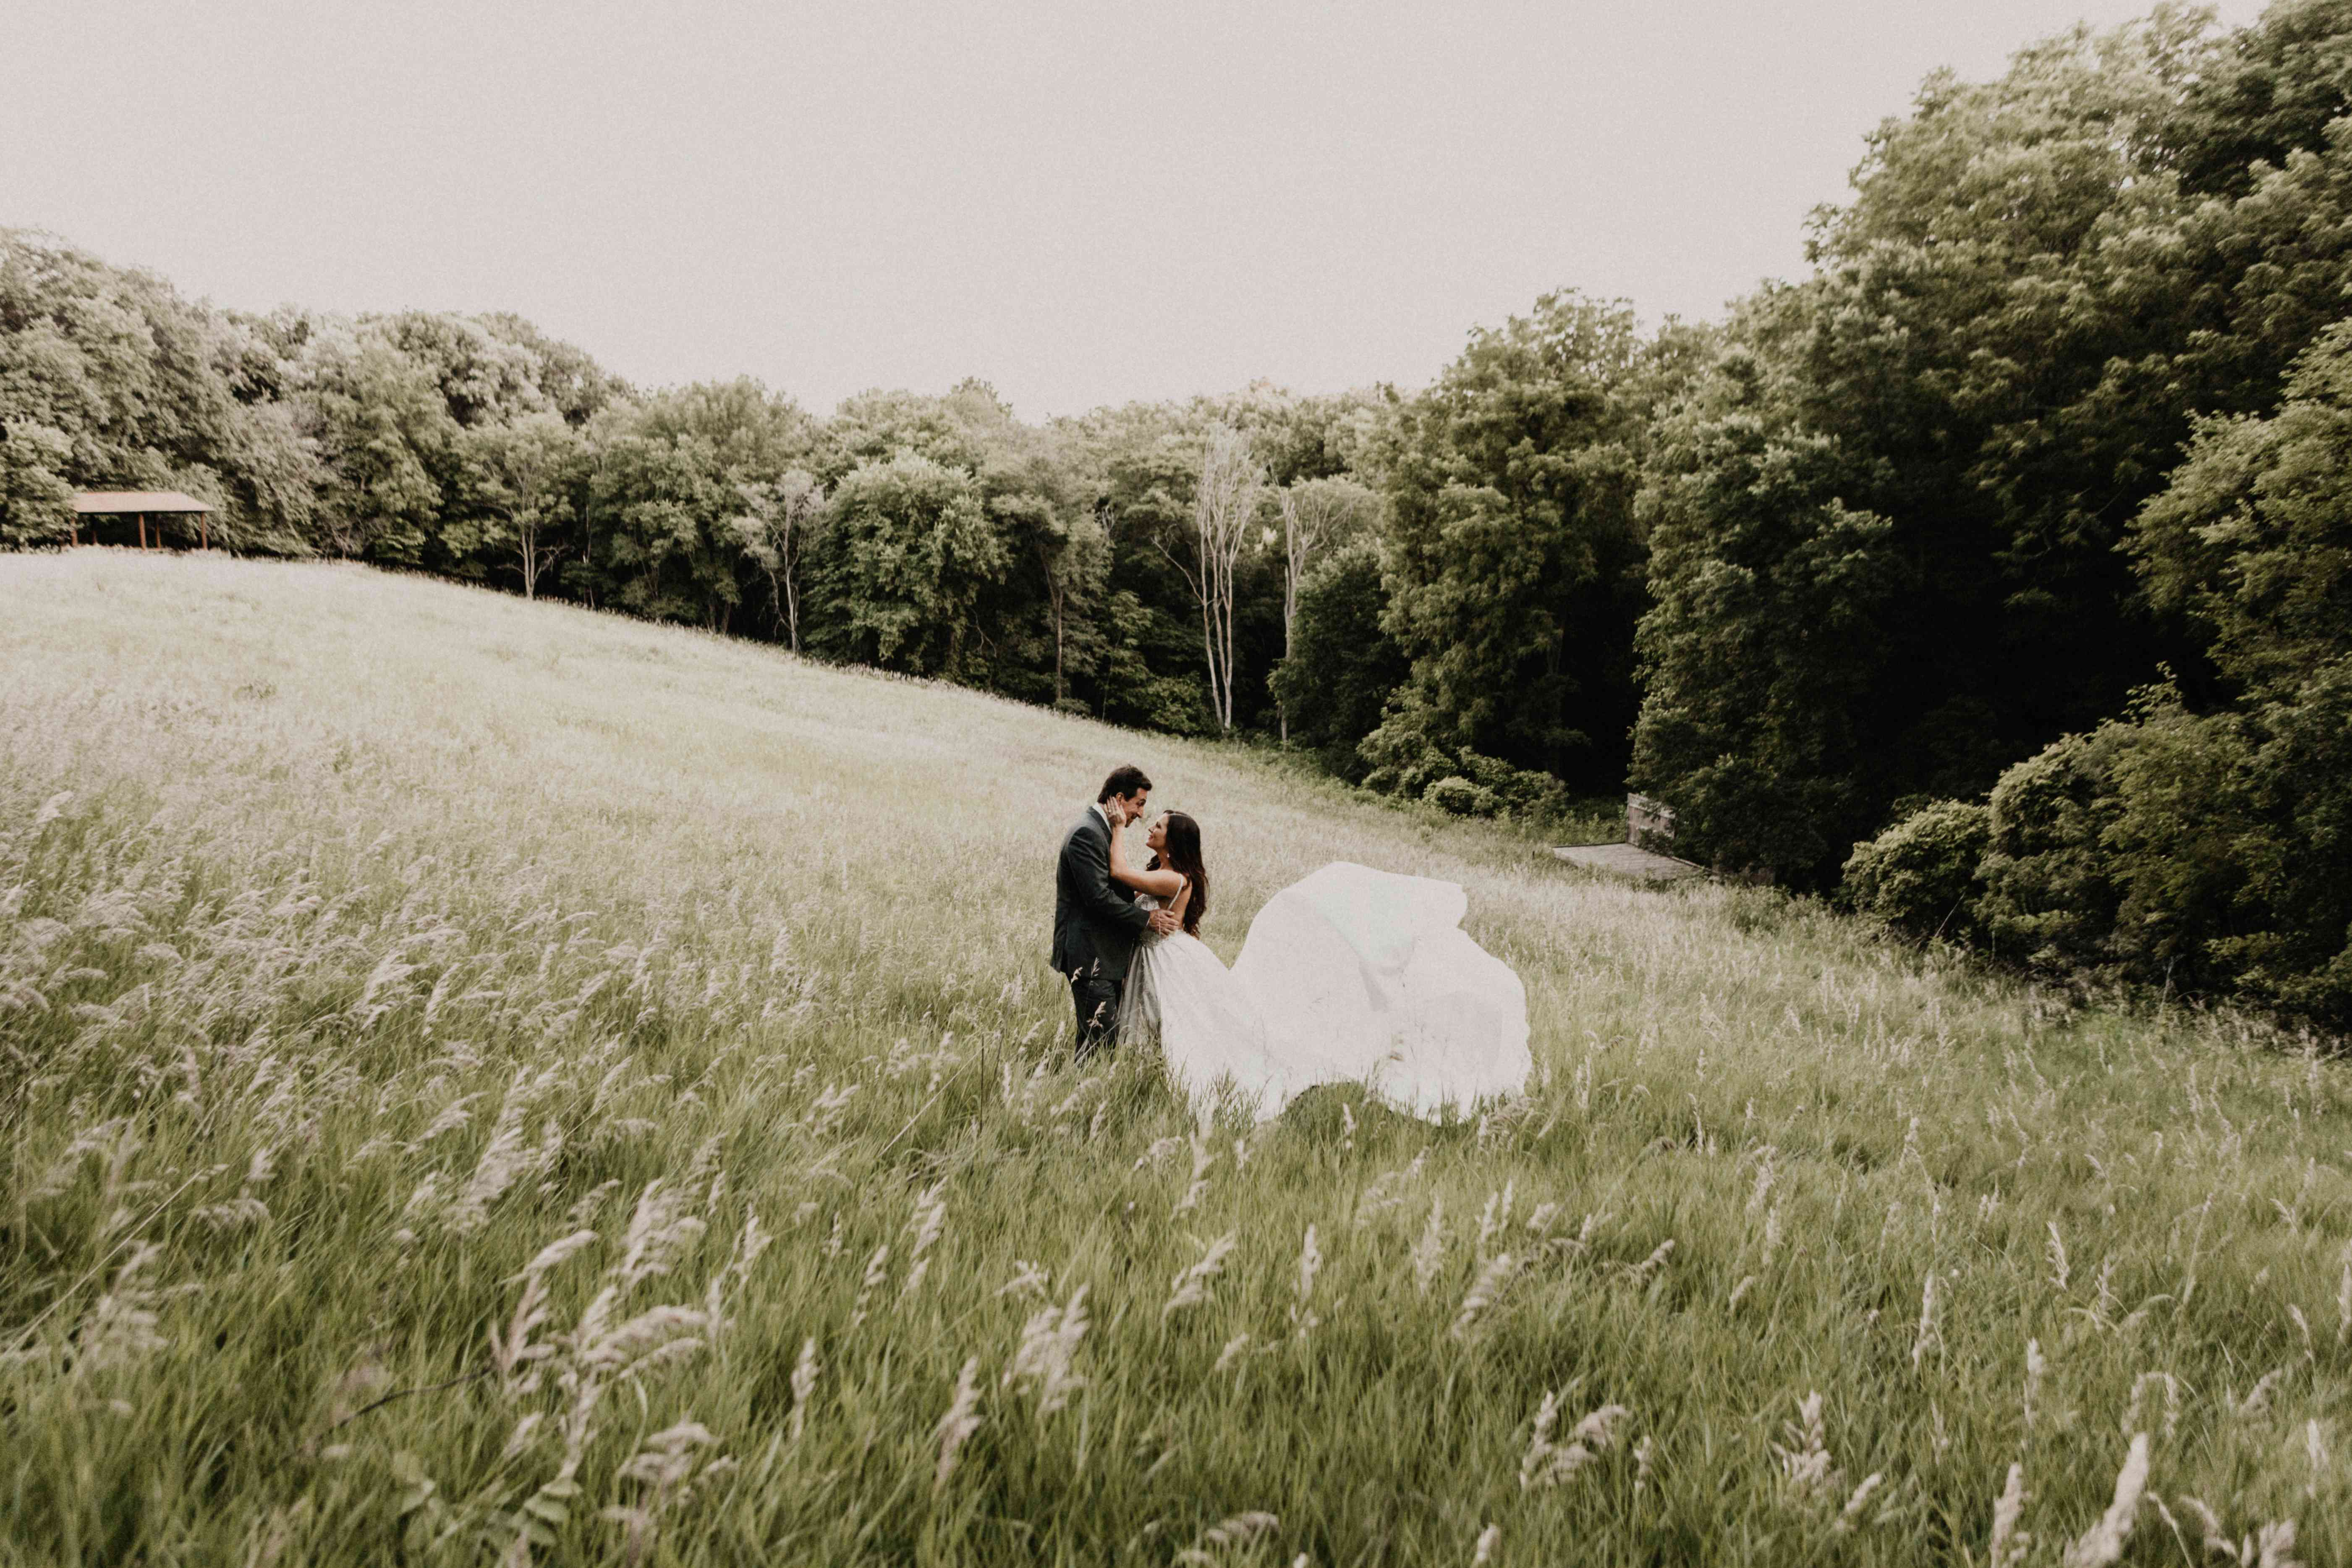 <p>Wedding photo at a field in Omaha, Nebraska</p>